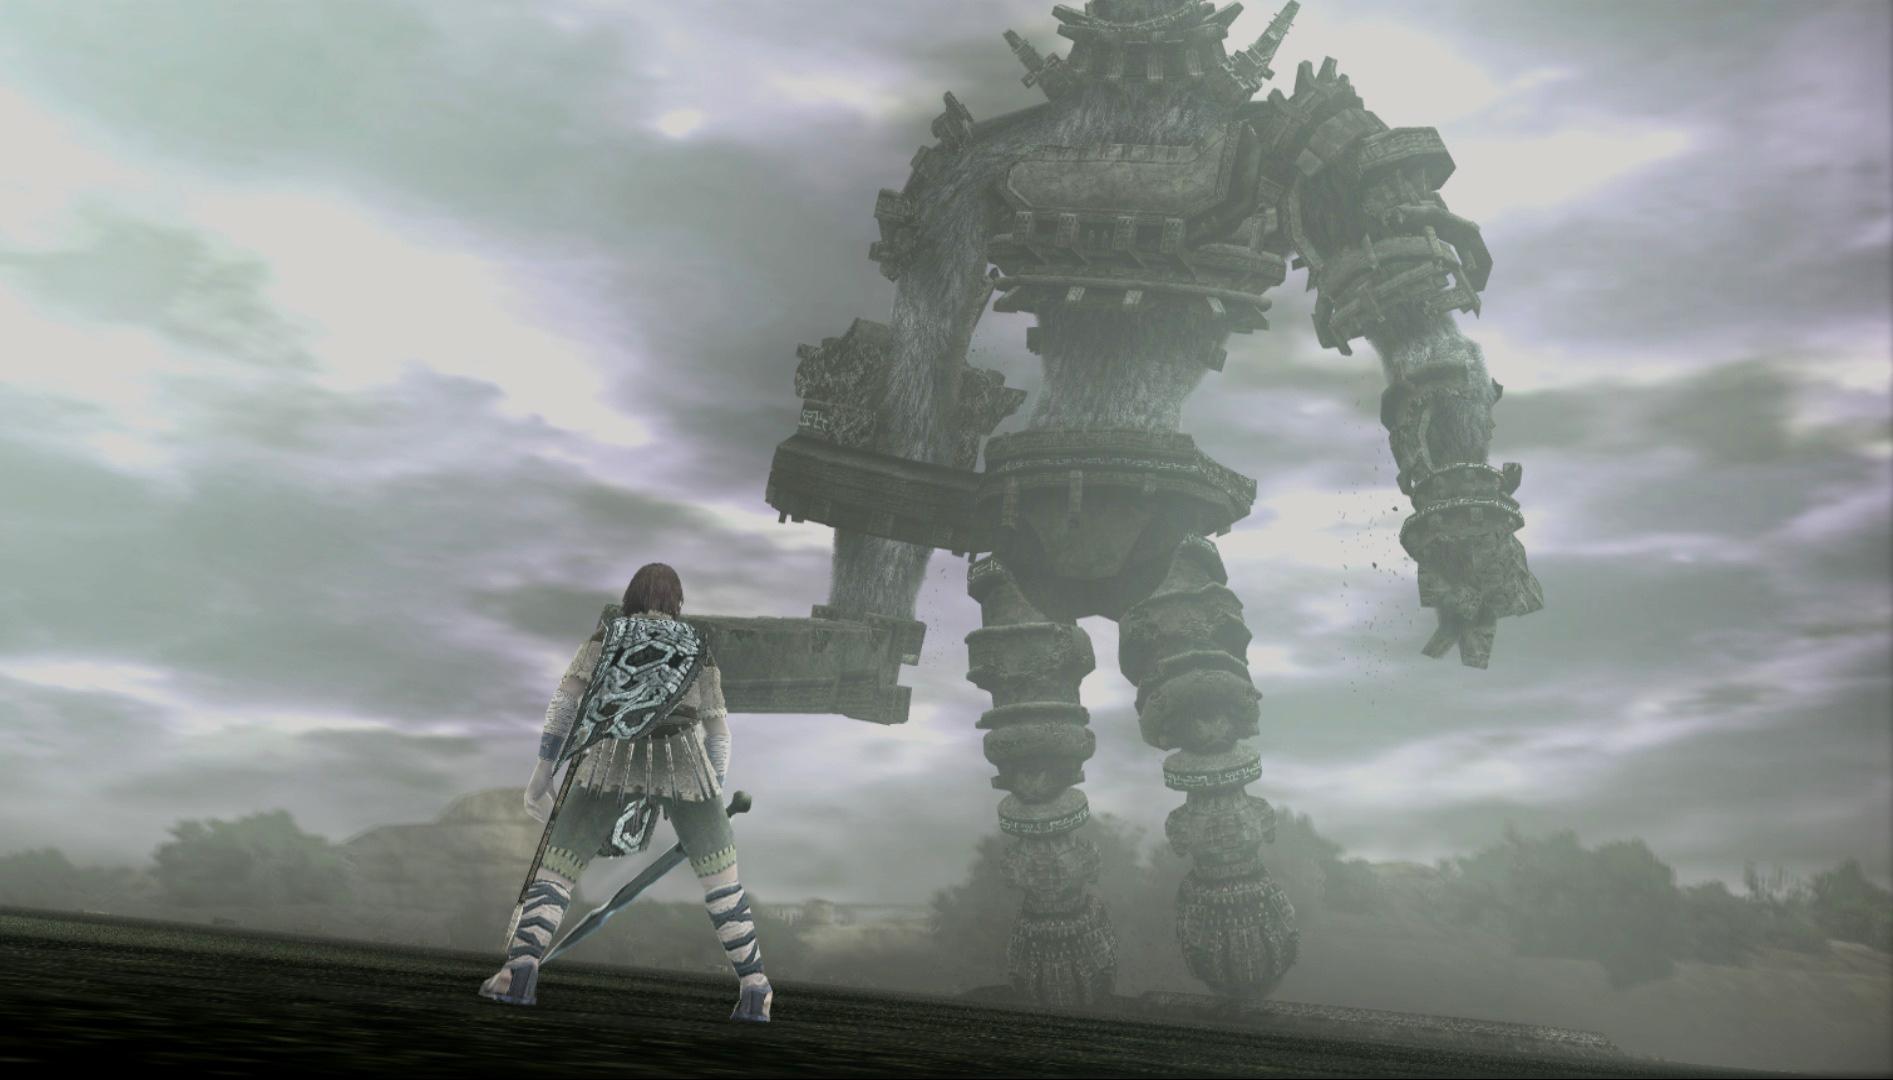 the-last-guardian-6.jpg - Last Guardian, the